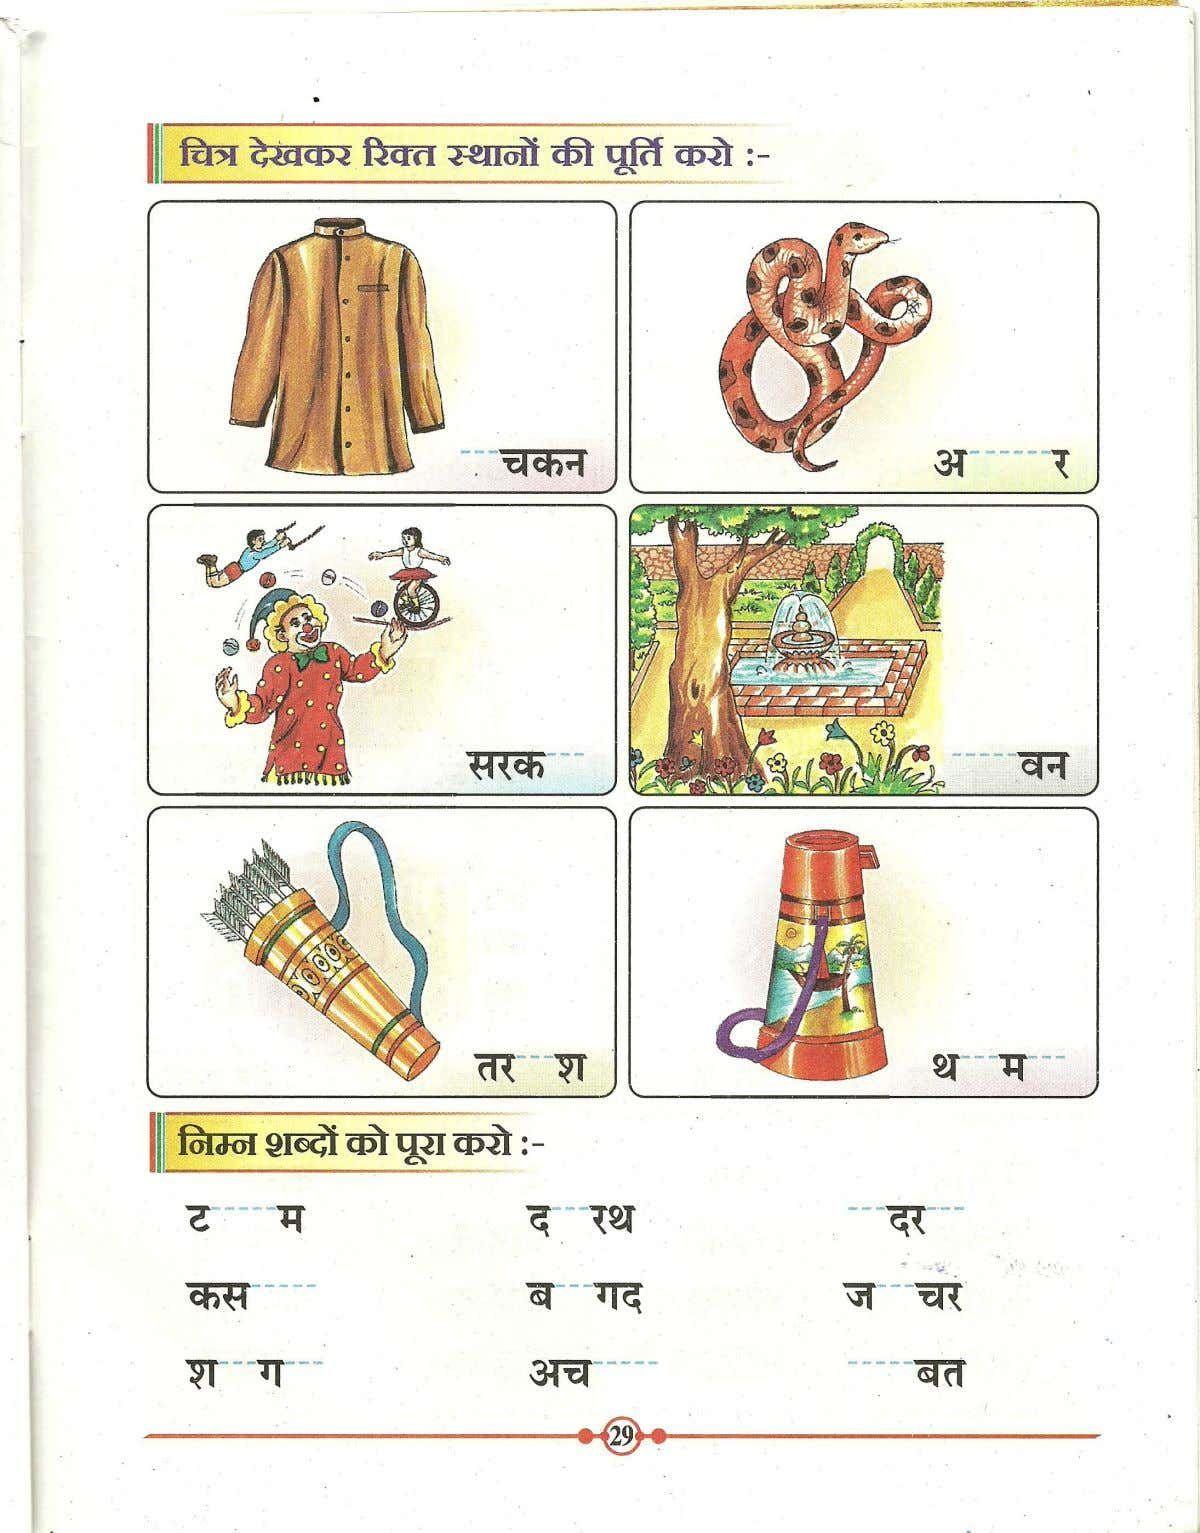 Hindi 4 Kids Alphabet In 2021 Hindi Language Learning Hindi Worksheets Hindi [ 1533 x 1200 Pixel ]